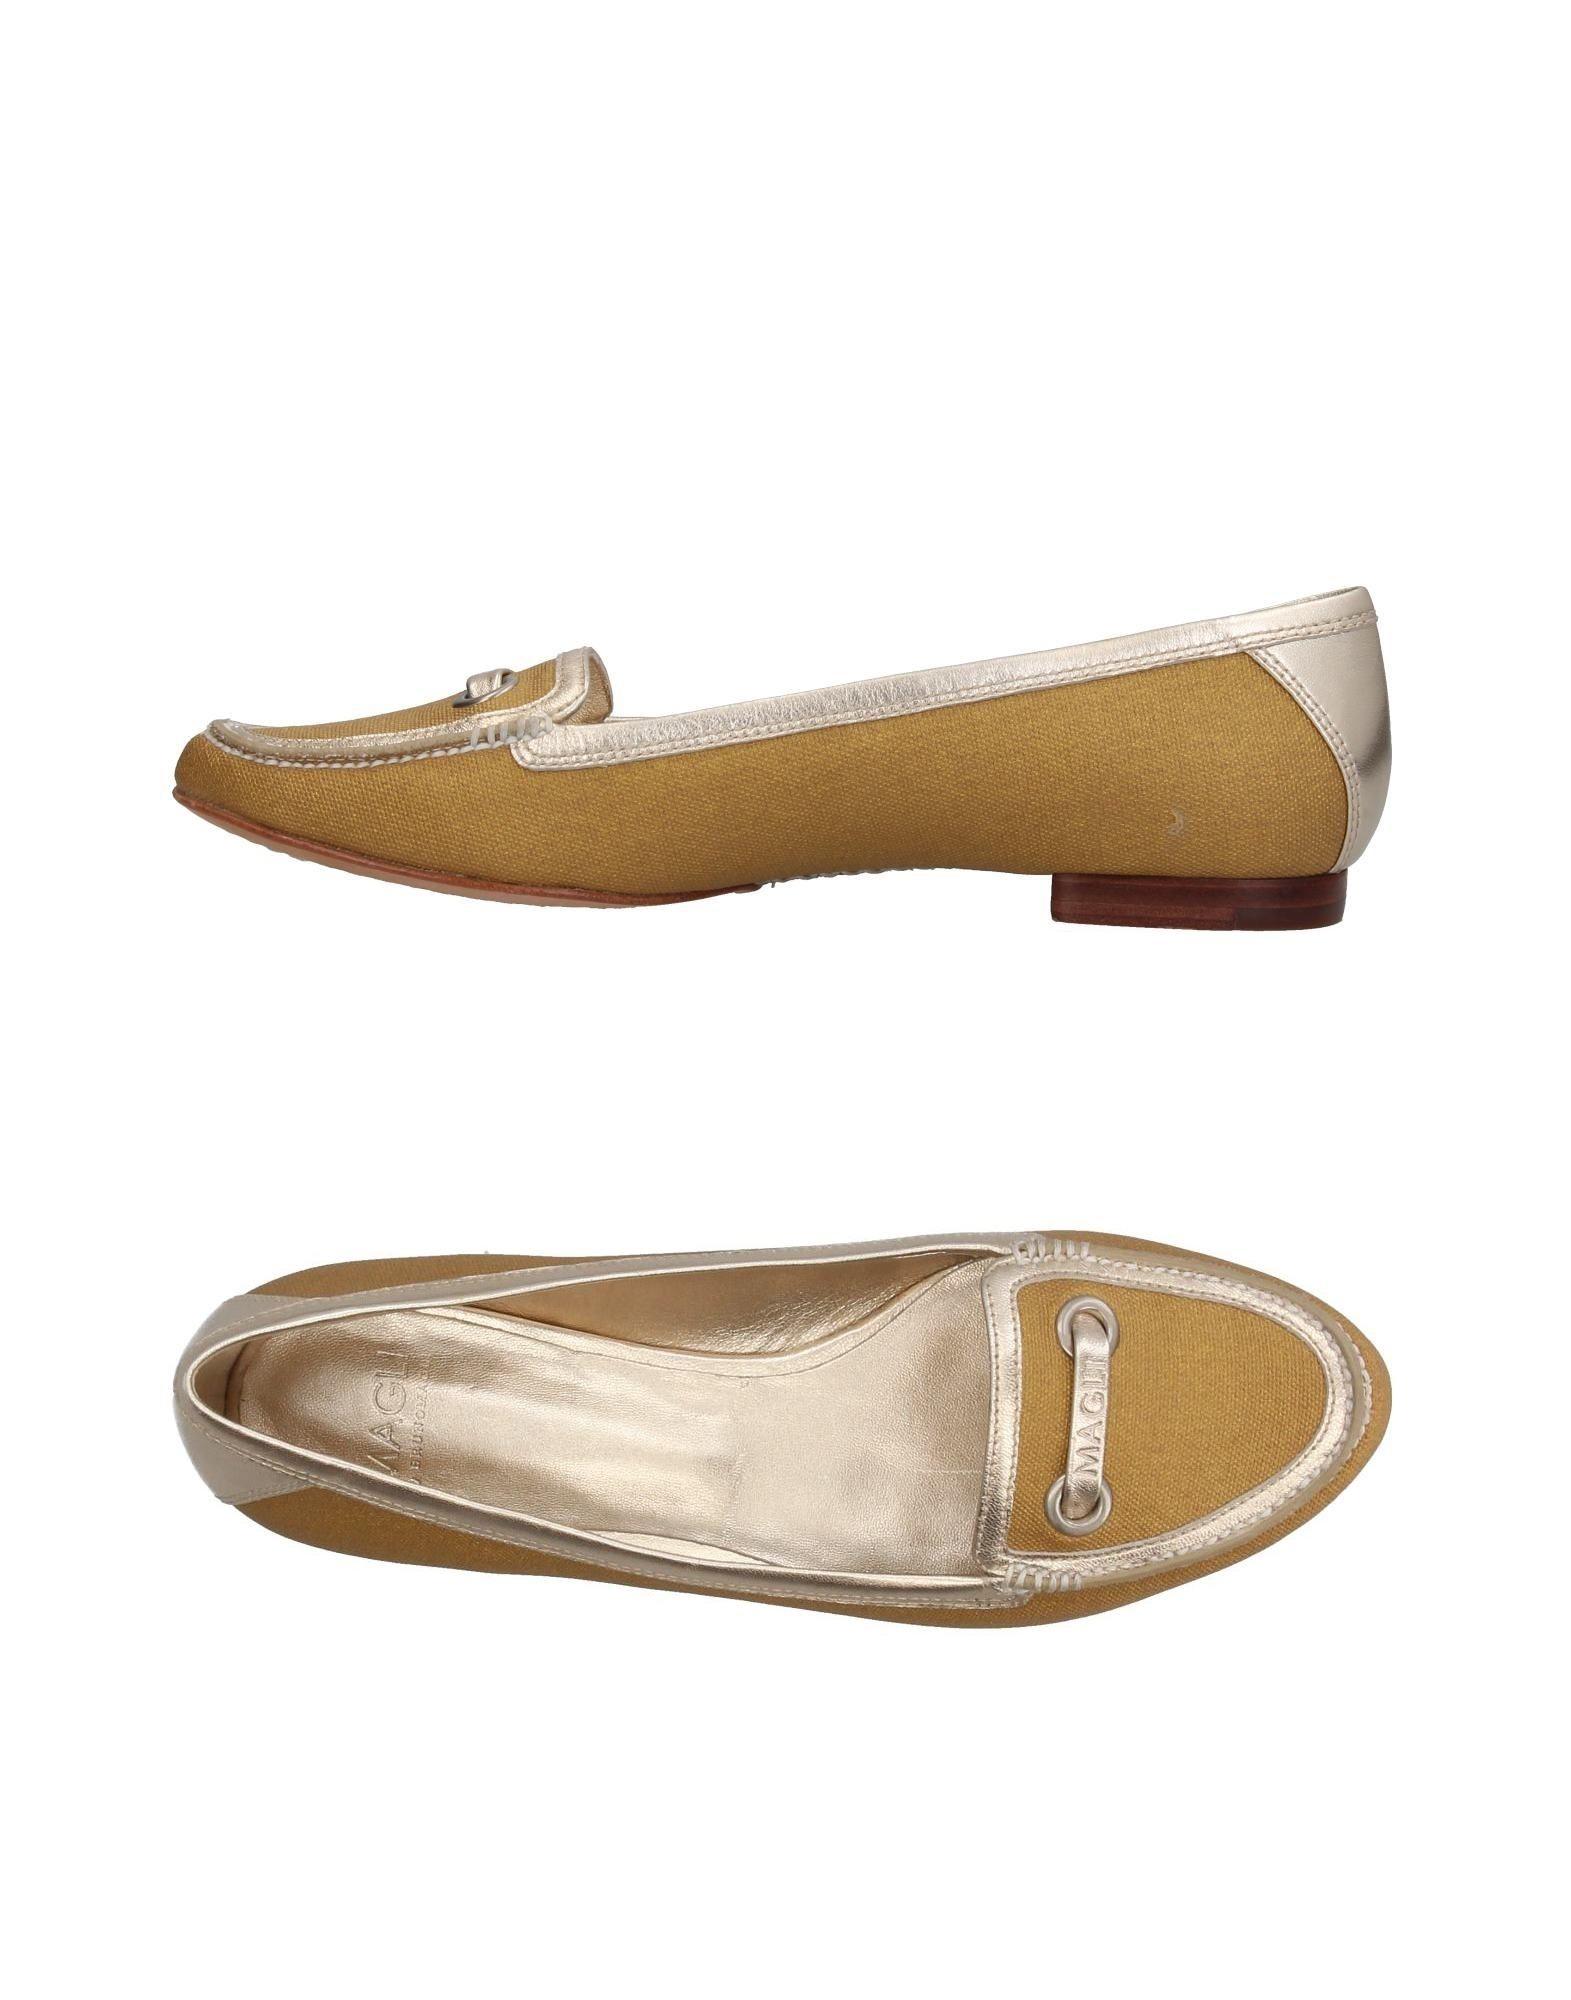 Magli By Bruno Magli Mokassins Damen  11384988OB Gute Qualität beliebte Schuhe